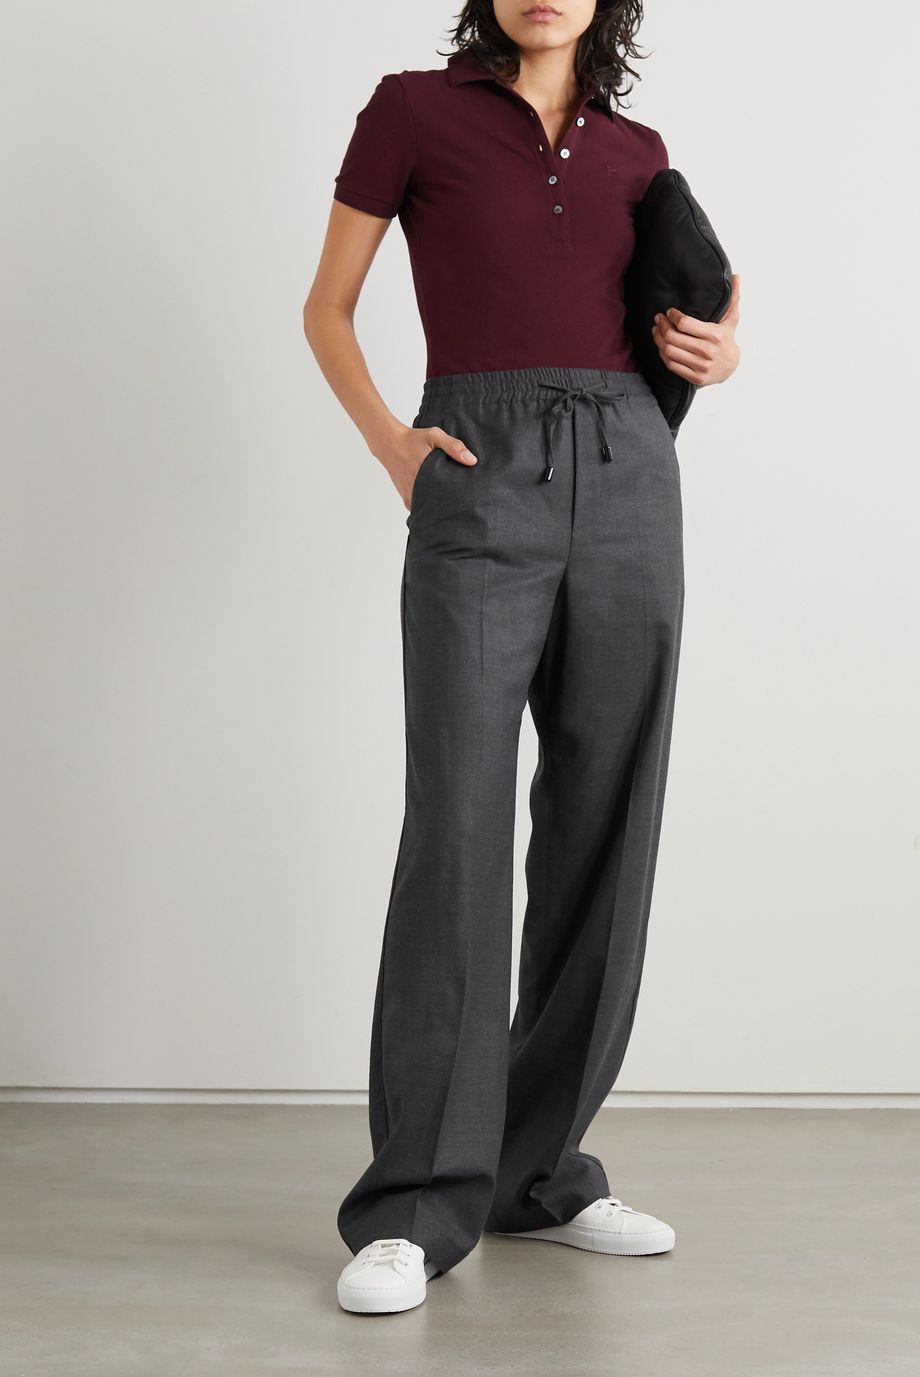 Maison Margiela 羊毛混纺法兰绒阔腿裤